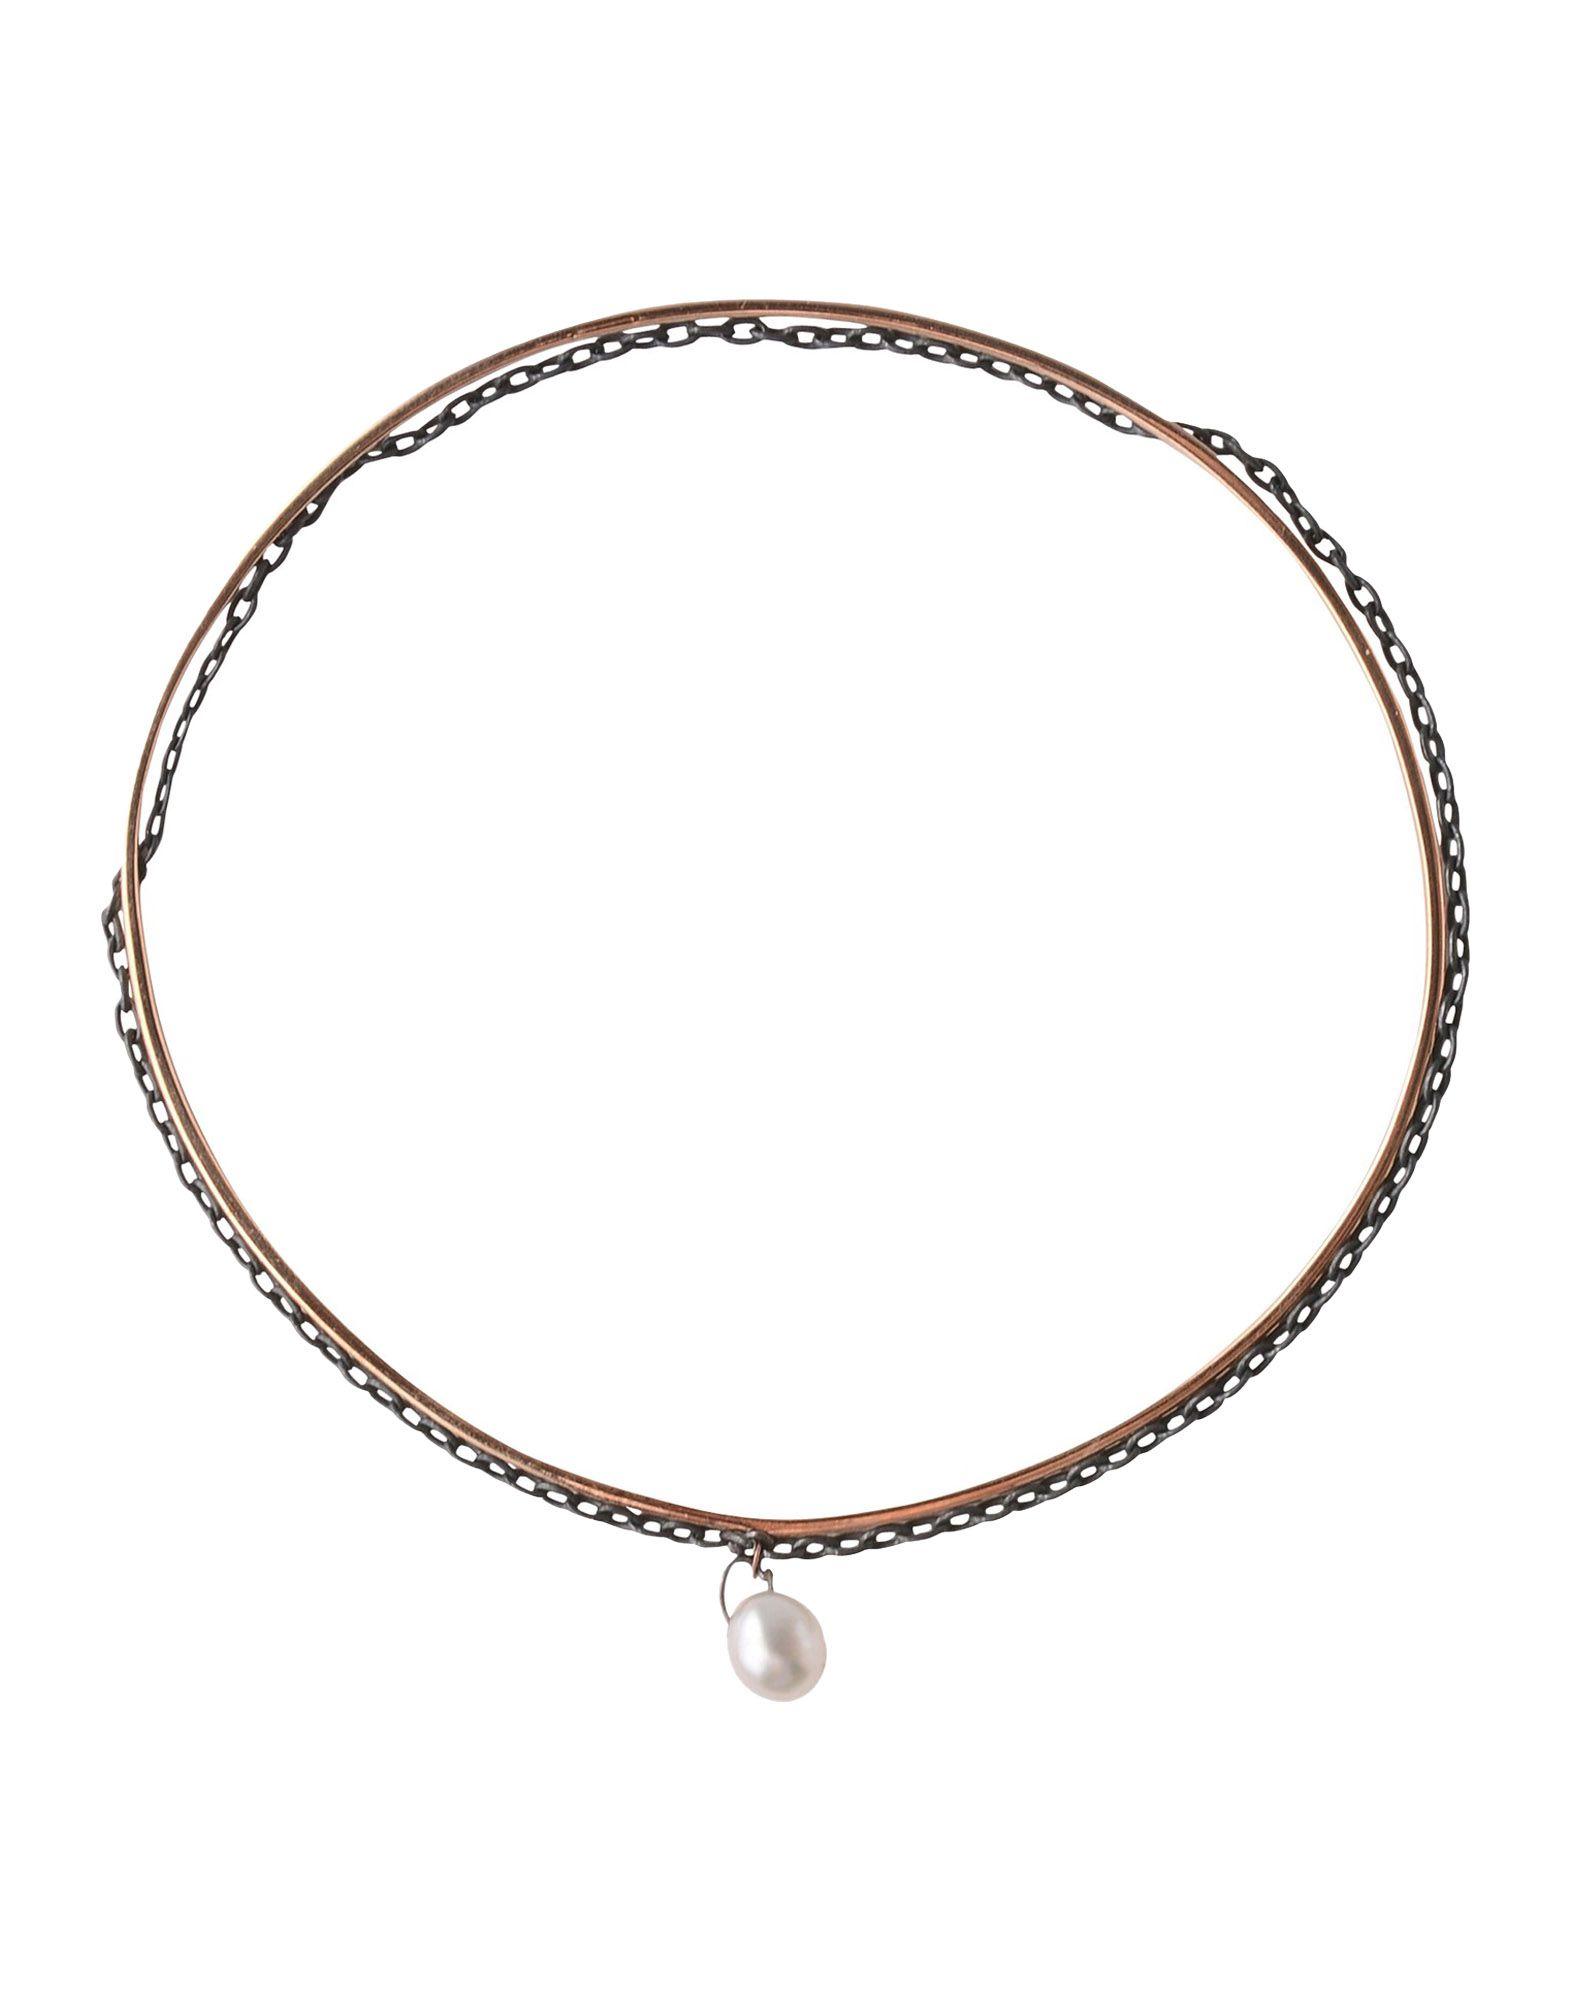 INEZ AND VINOODH Bracelet in Copper